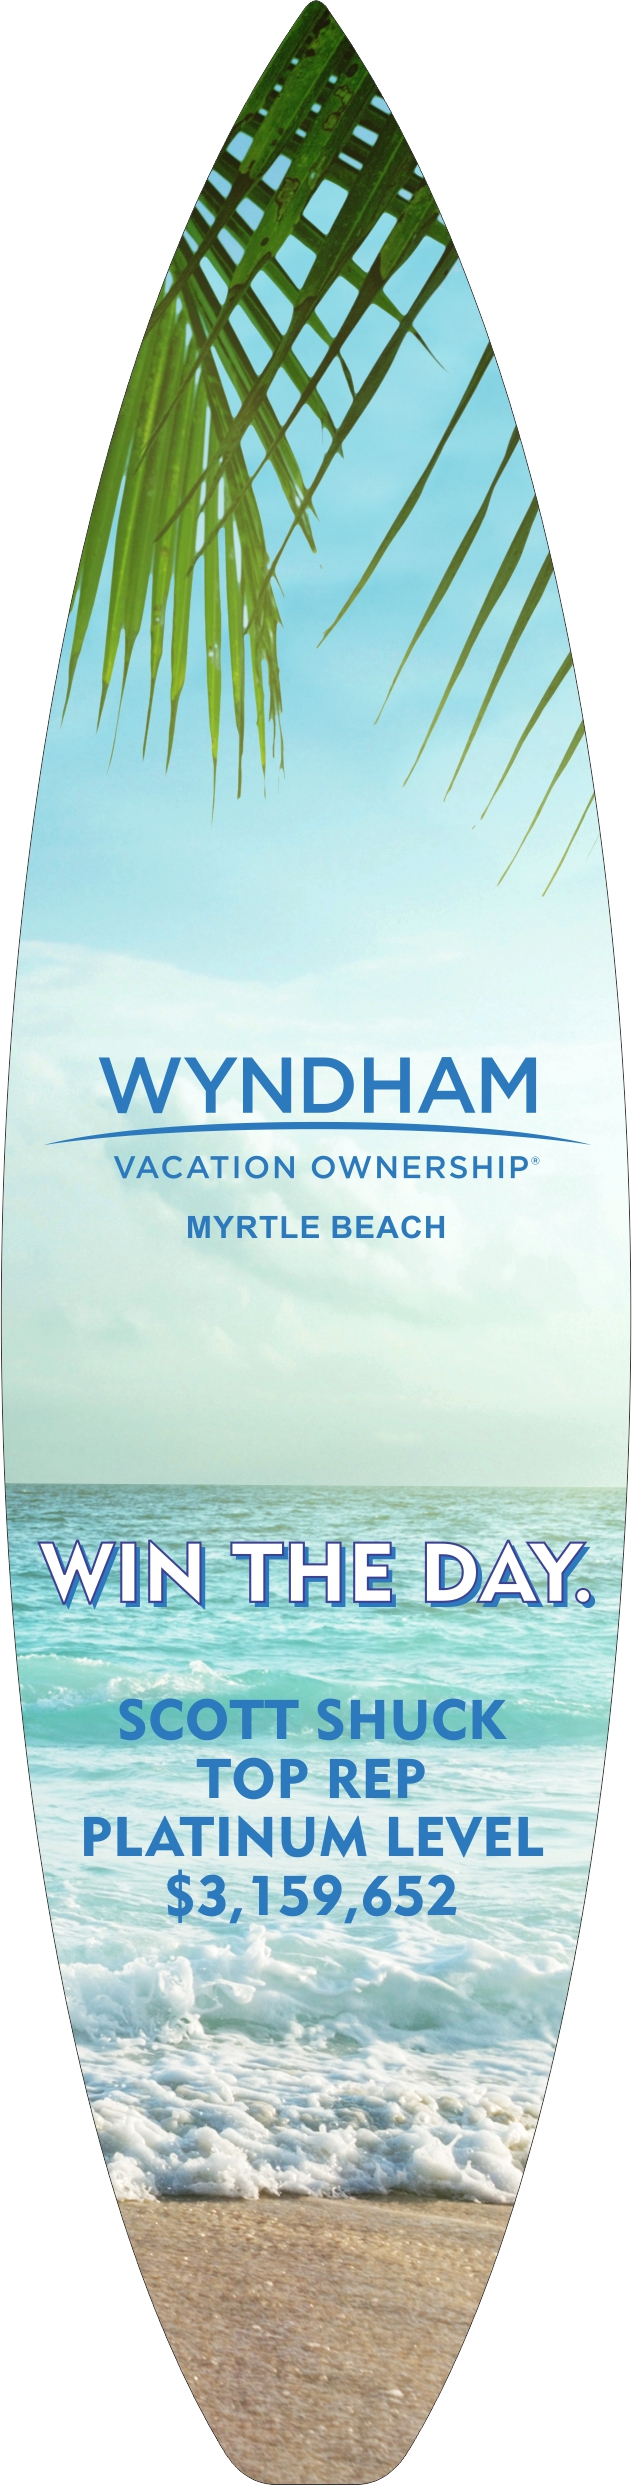 Wyndham Surf Awards.jpg